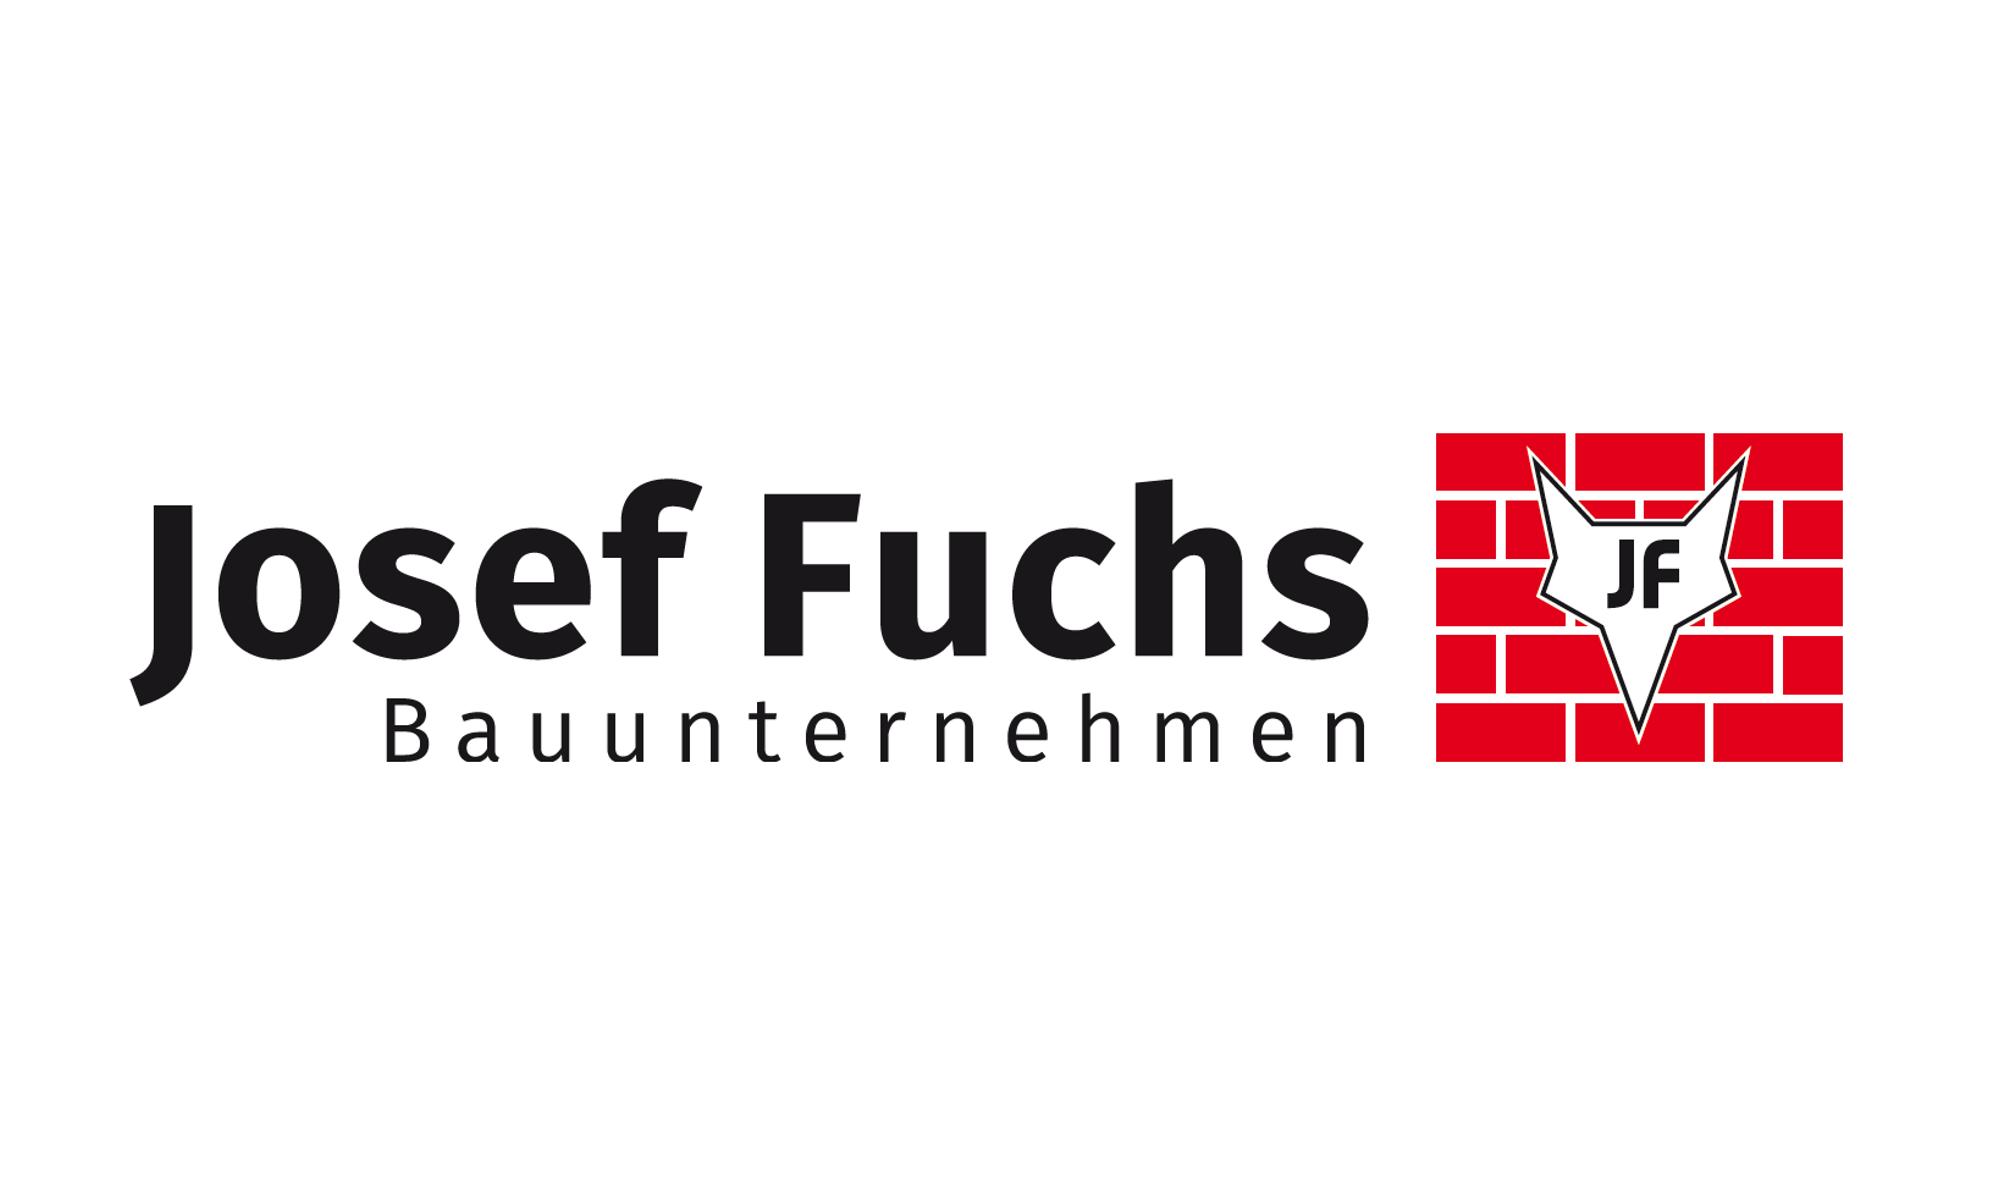 Josef-Fuchs